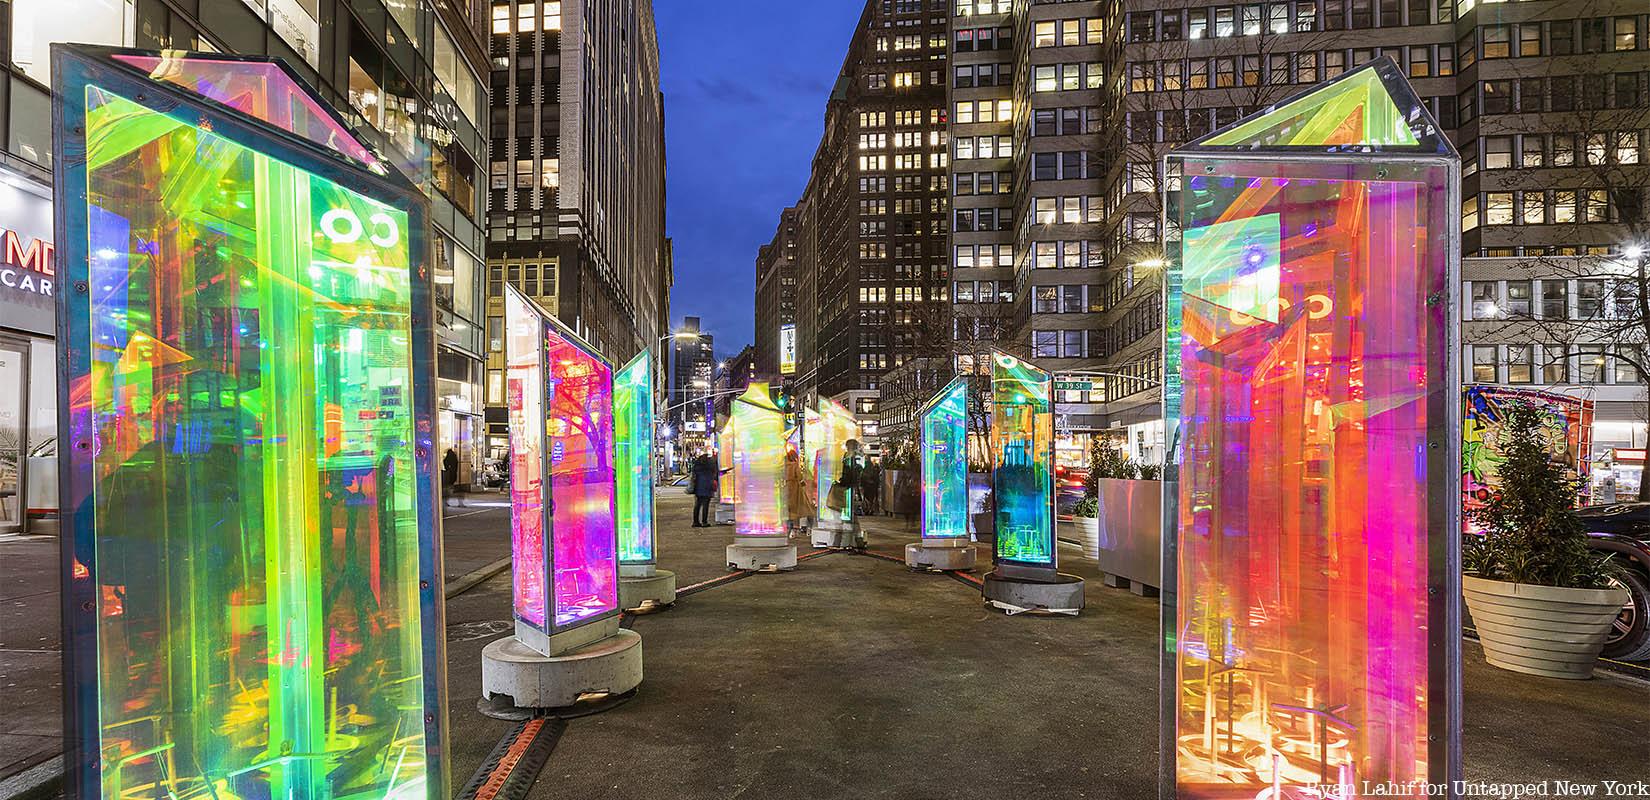 Prismatica Garment District Broadway-Malls-Art-Installation-NYC Untapped cities.jpg